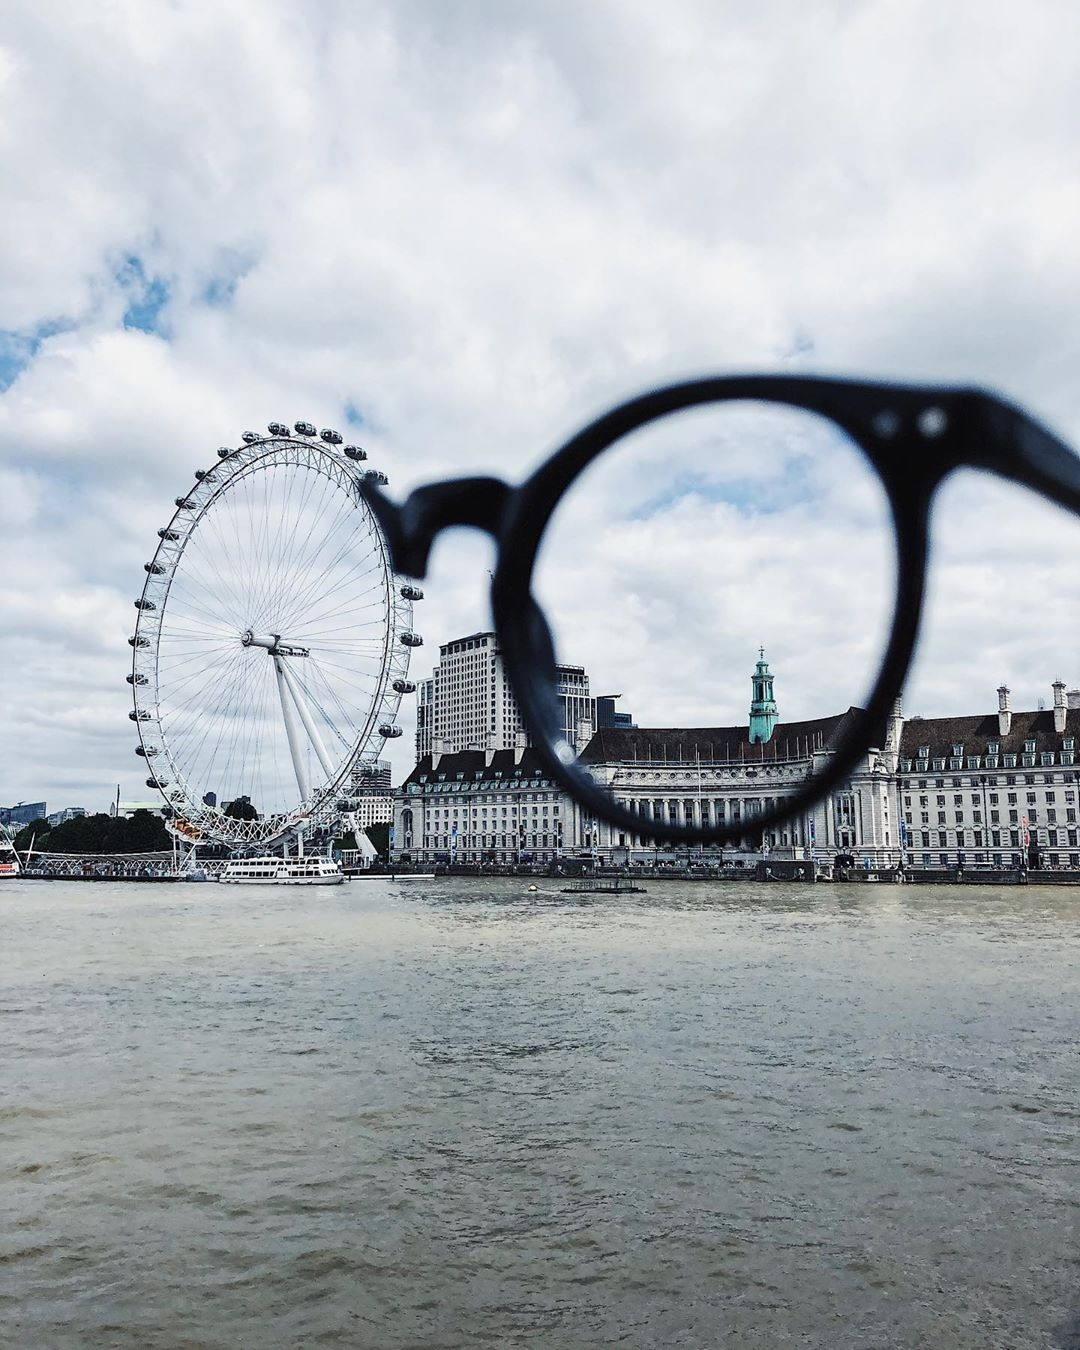 «Лондонские глаза». Колесо обозрения, Лондон. Автор Тиаго Силва